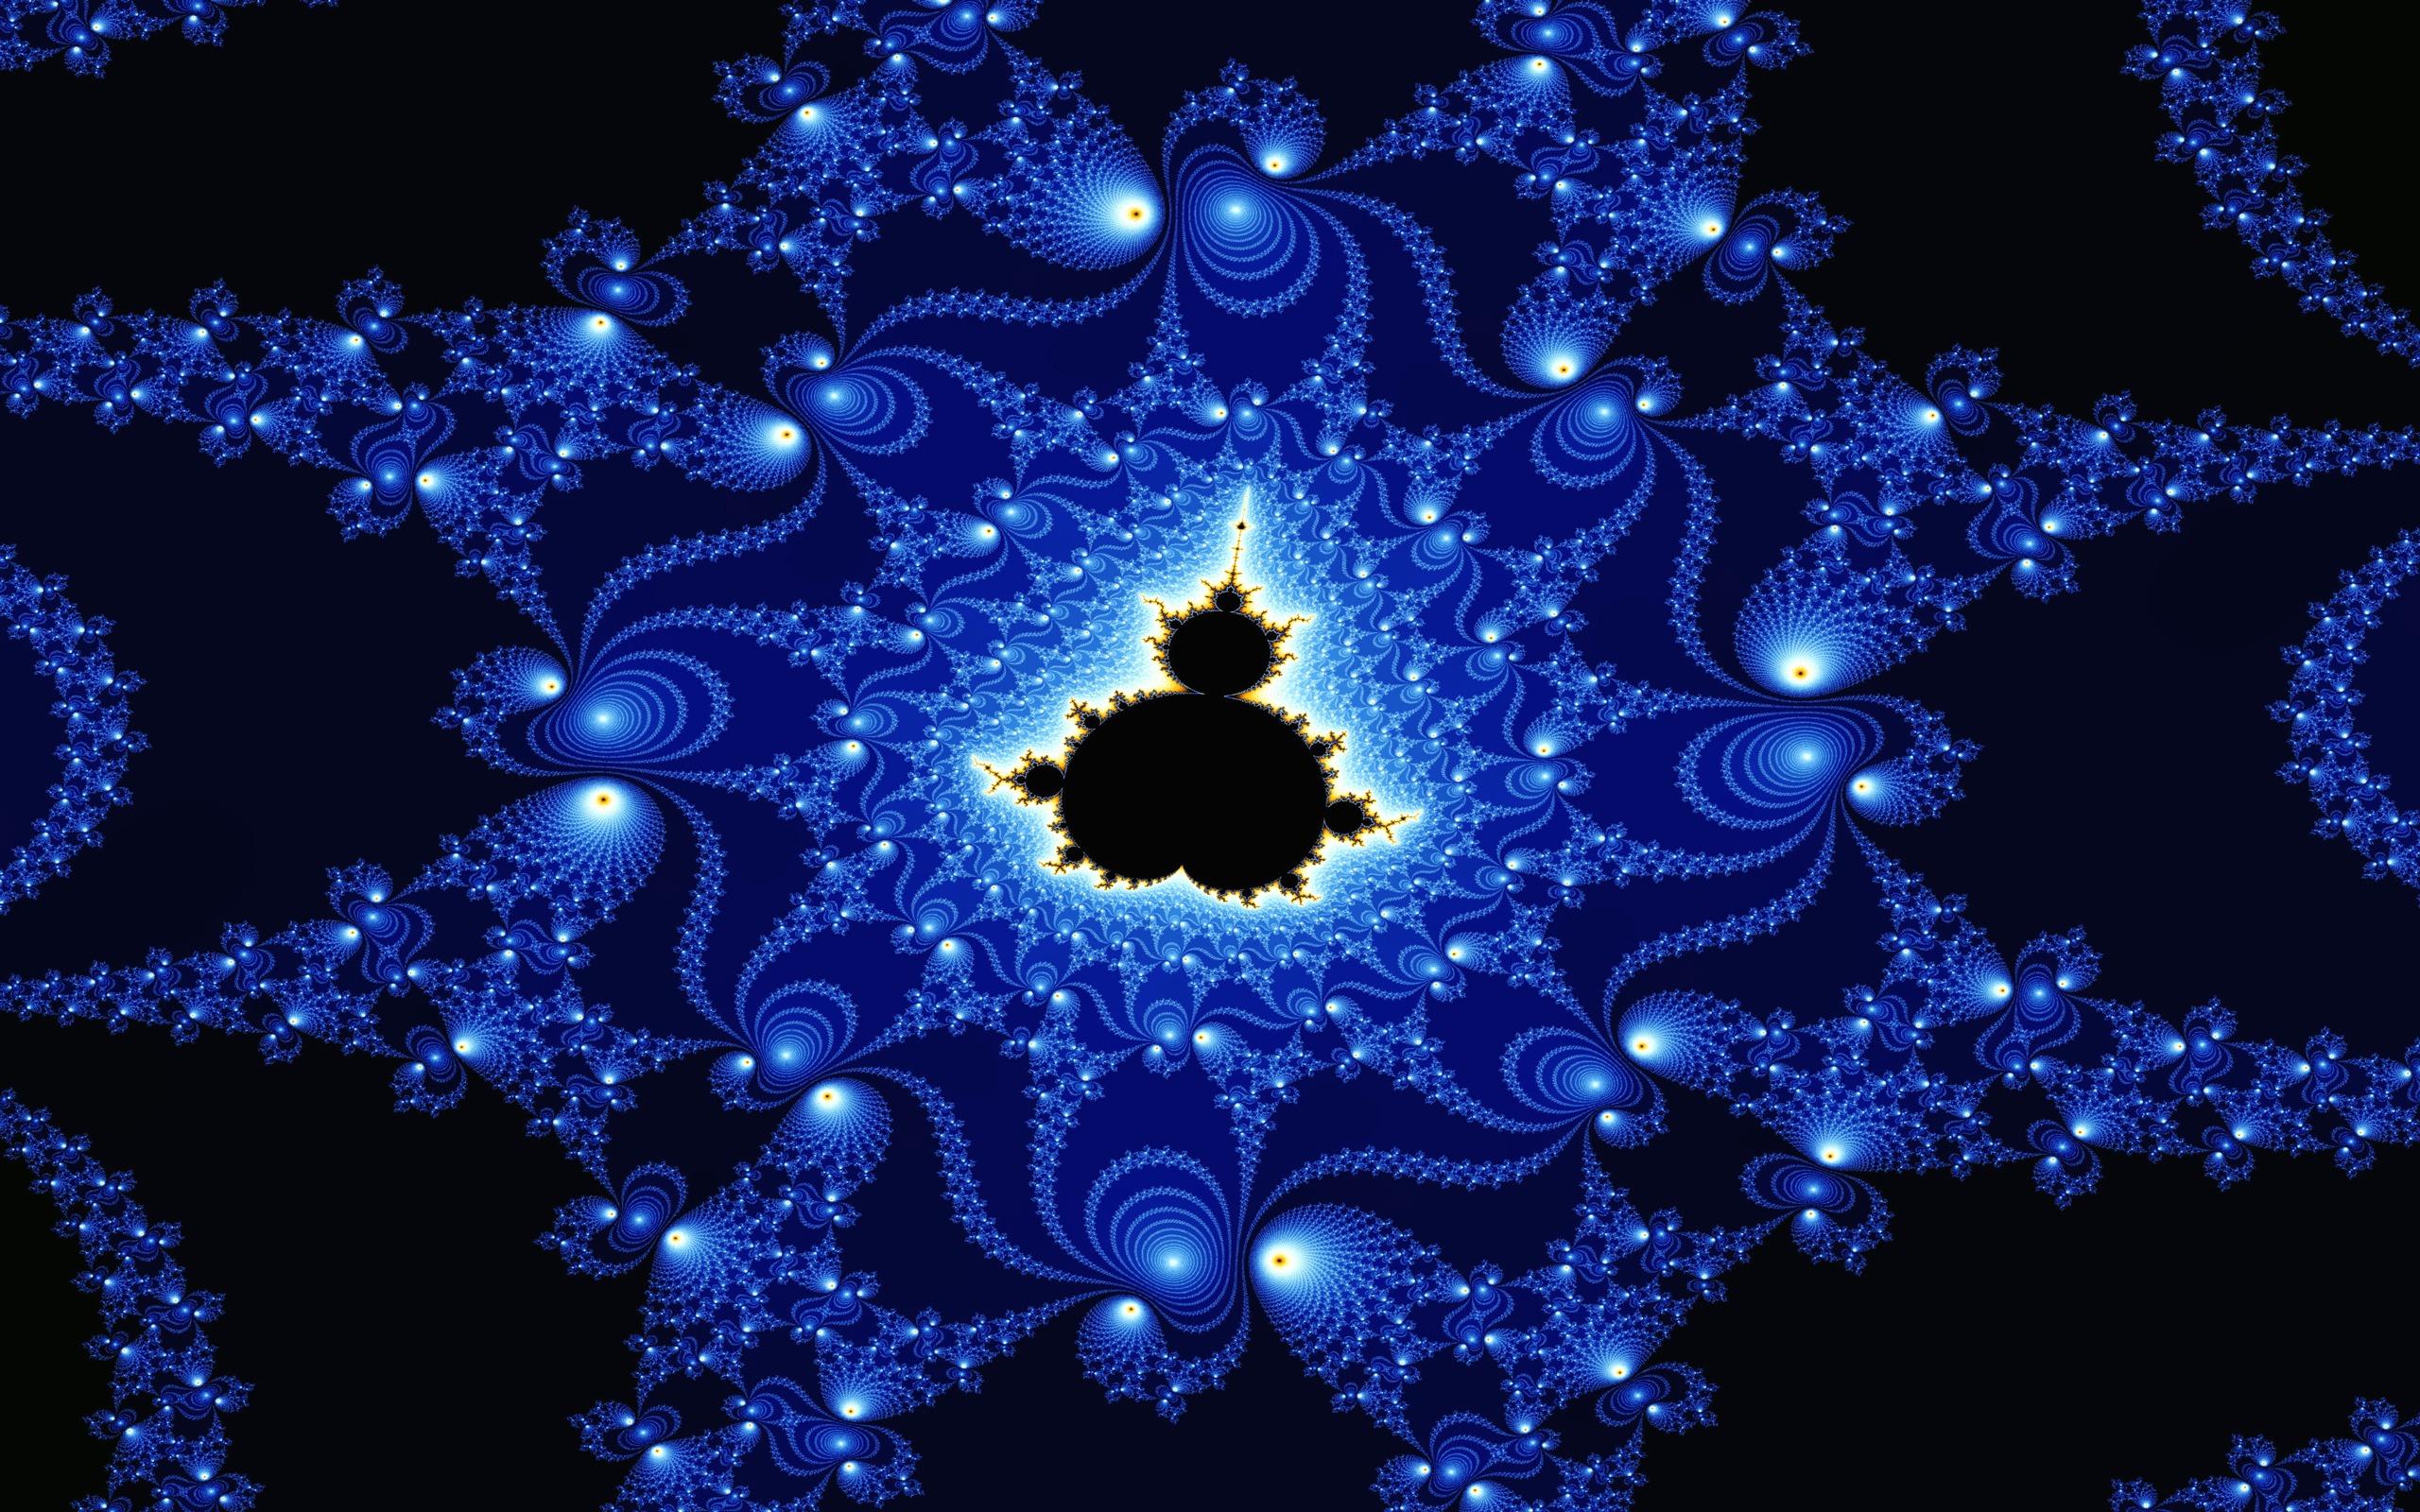 fractal Wallpaper Background 627 2560x1600